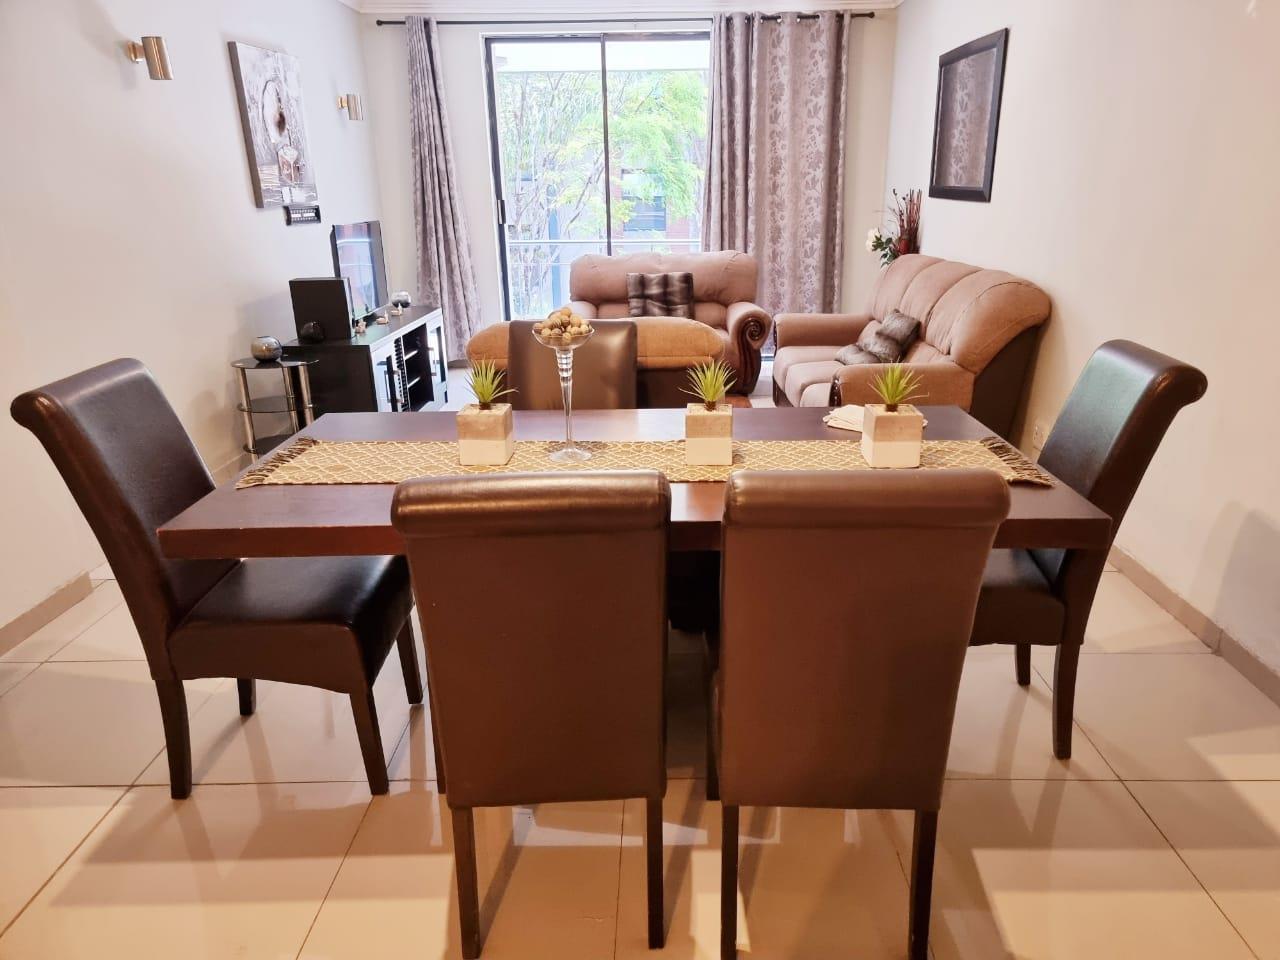 Apartment Rental Monthly in Germiston